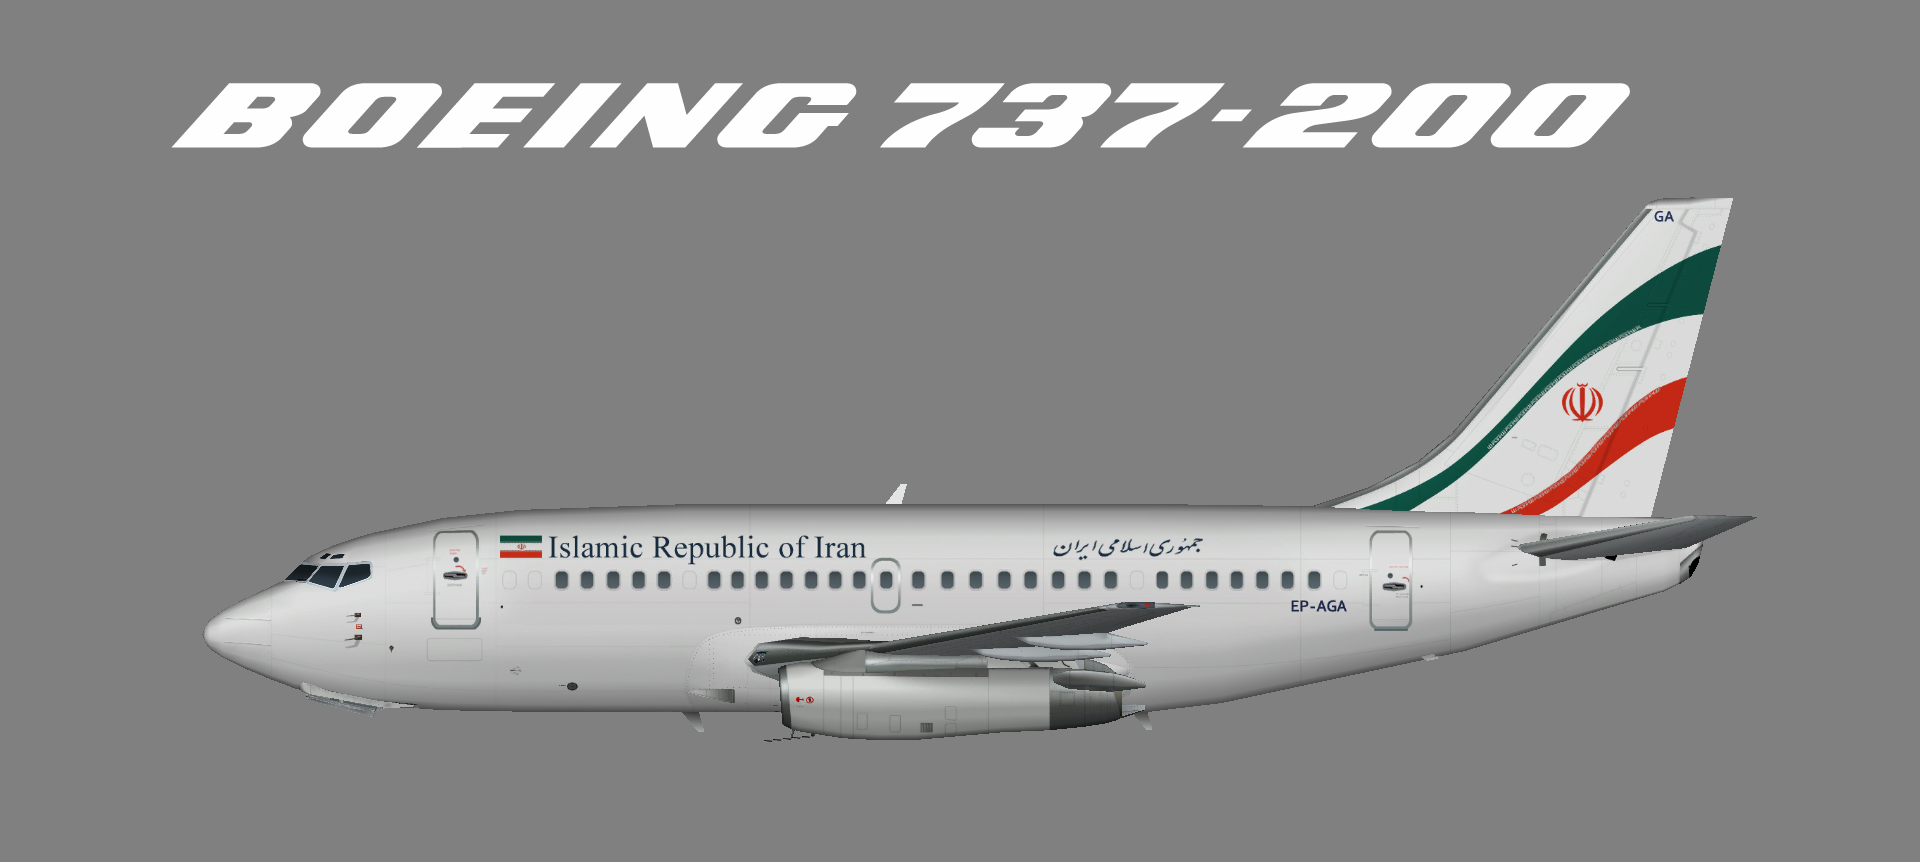 Iran Government 737-200